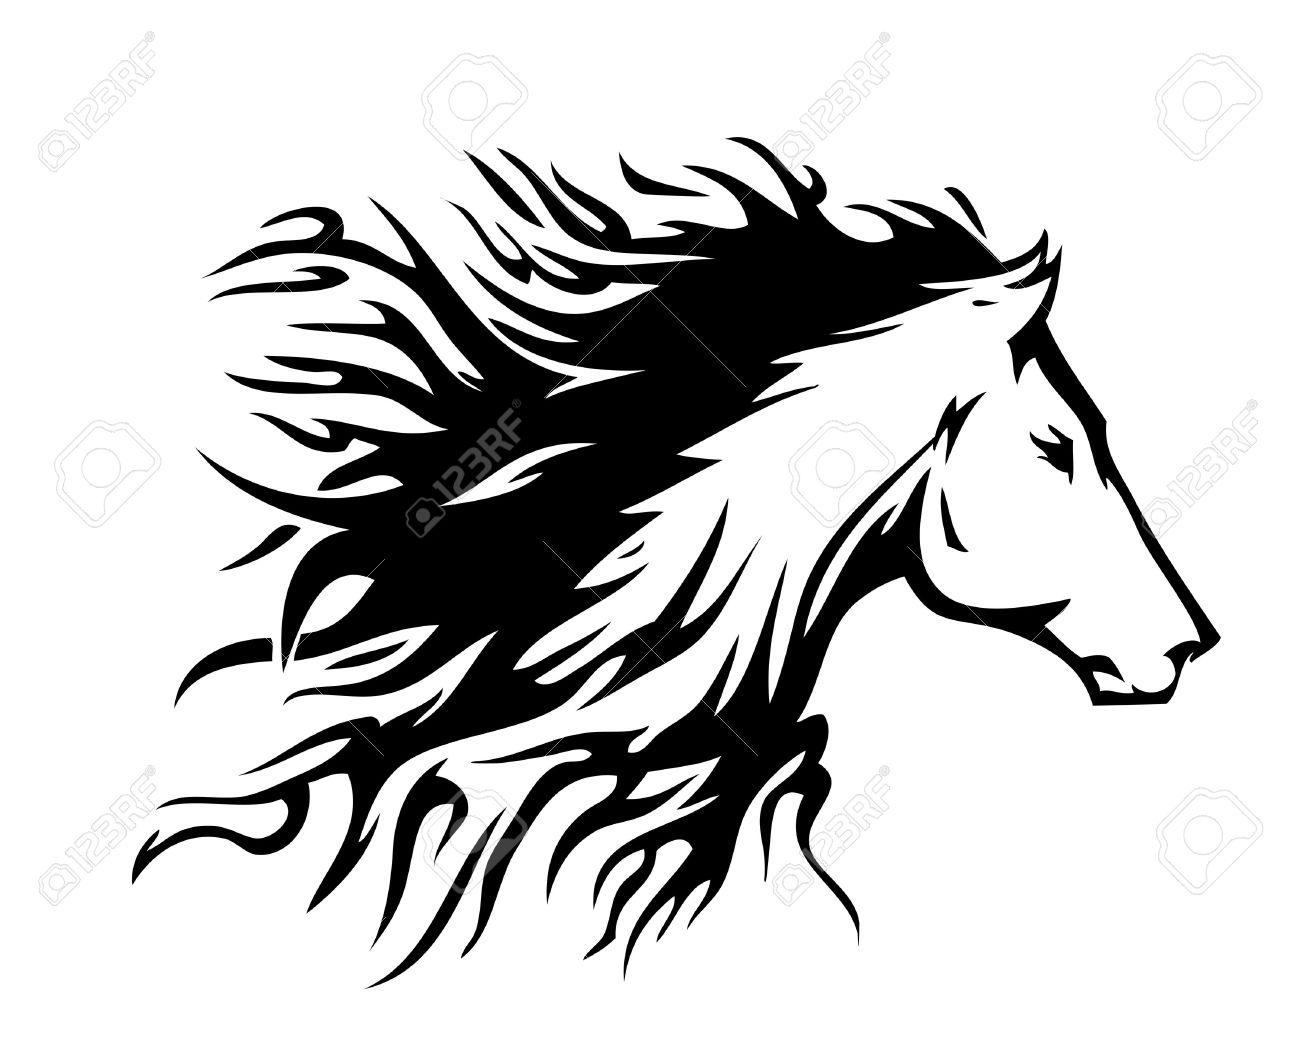 Fiery Horses Clipart